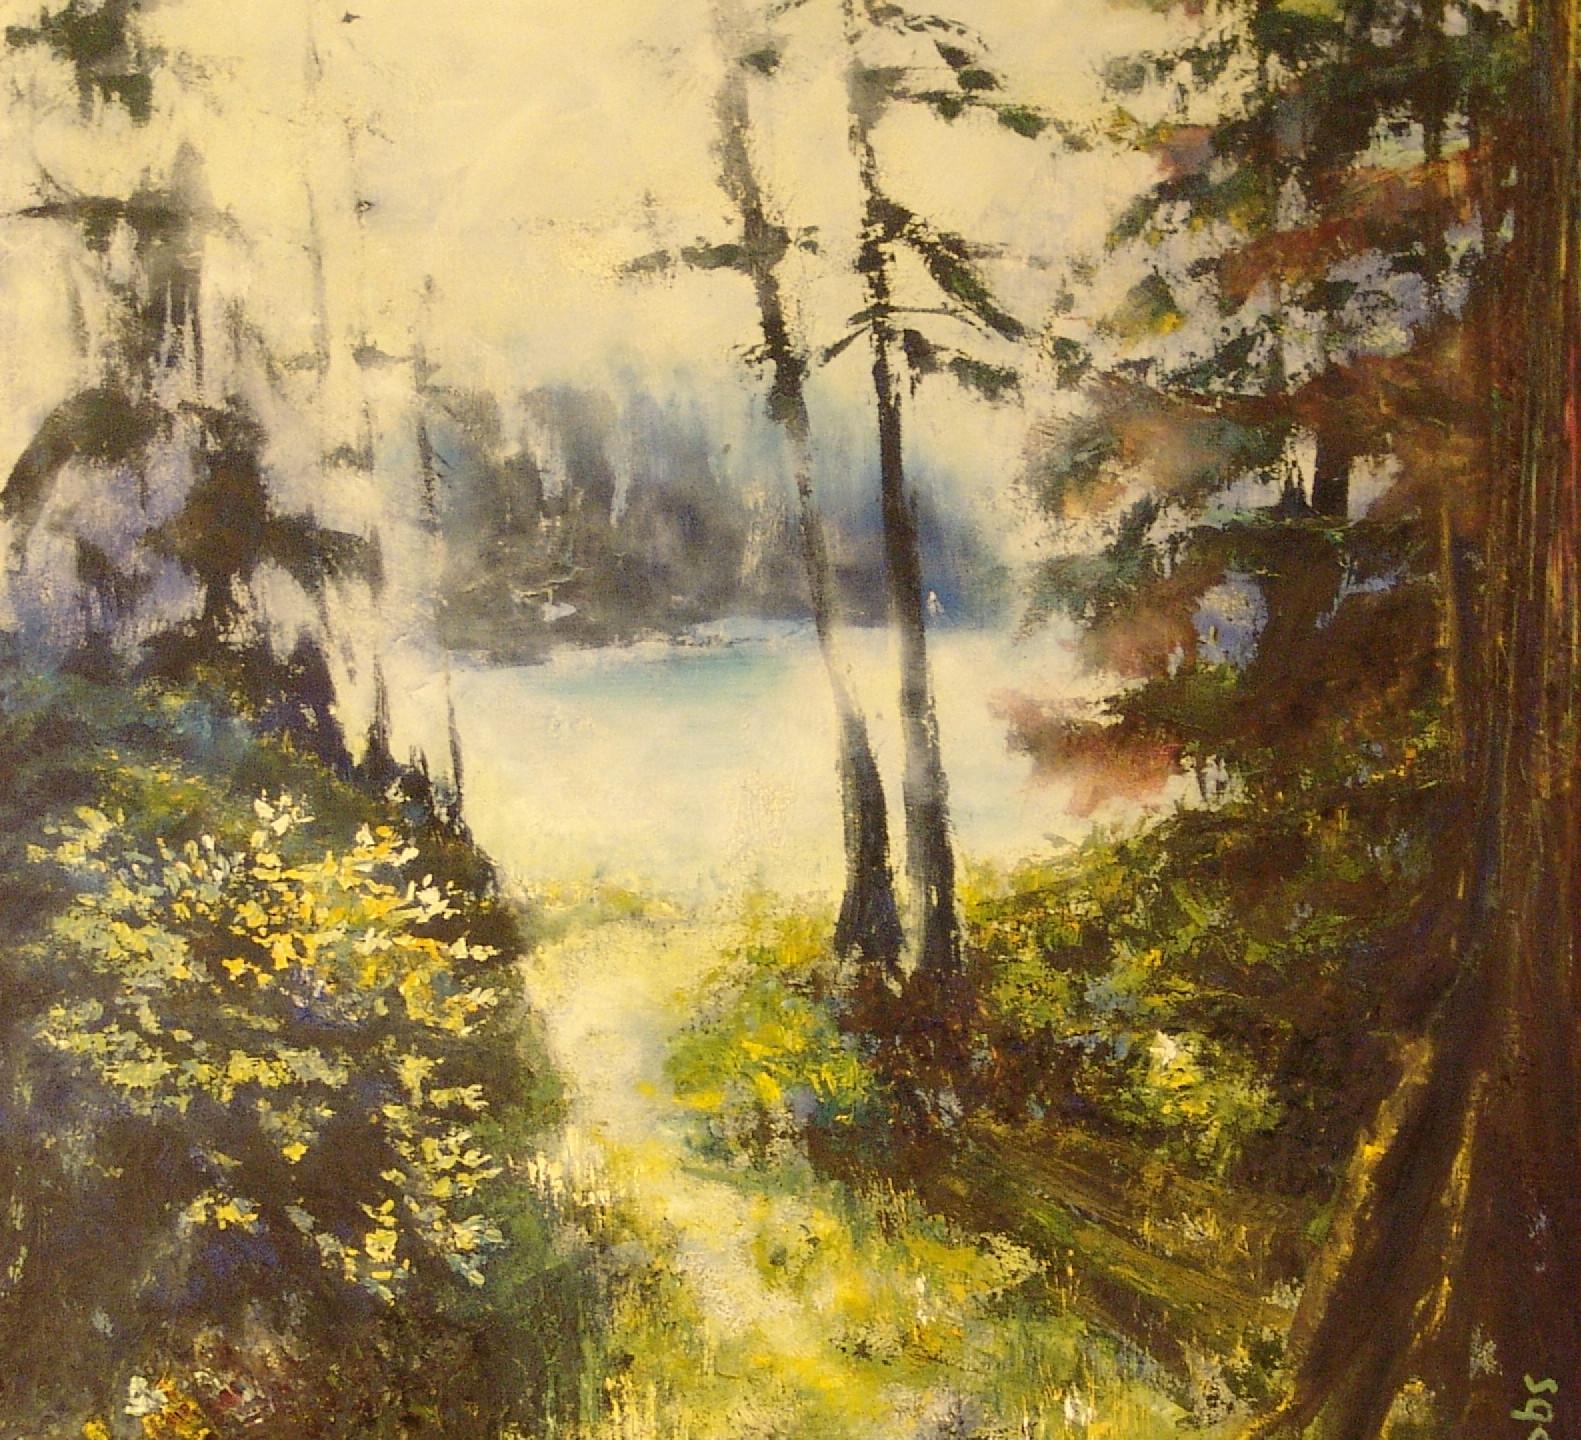 Bibbs, Susan - Winter Mist at Keel Cove, Neck Point Park on Vancouver Island